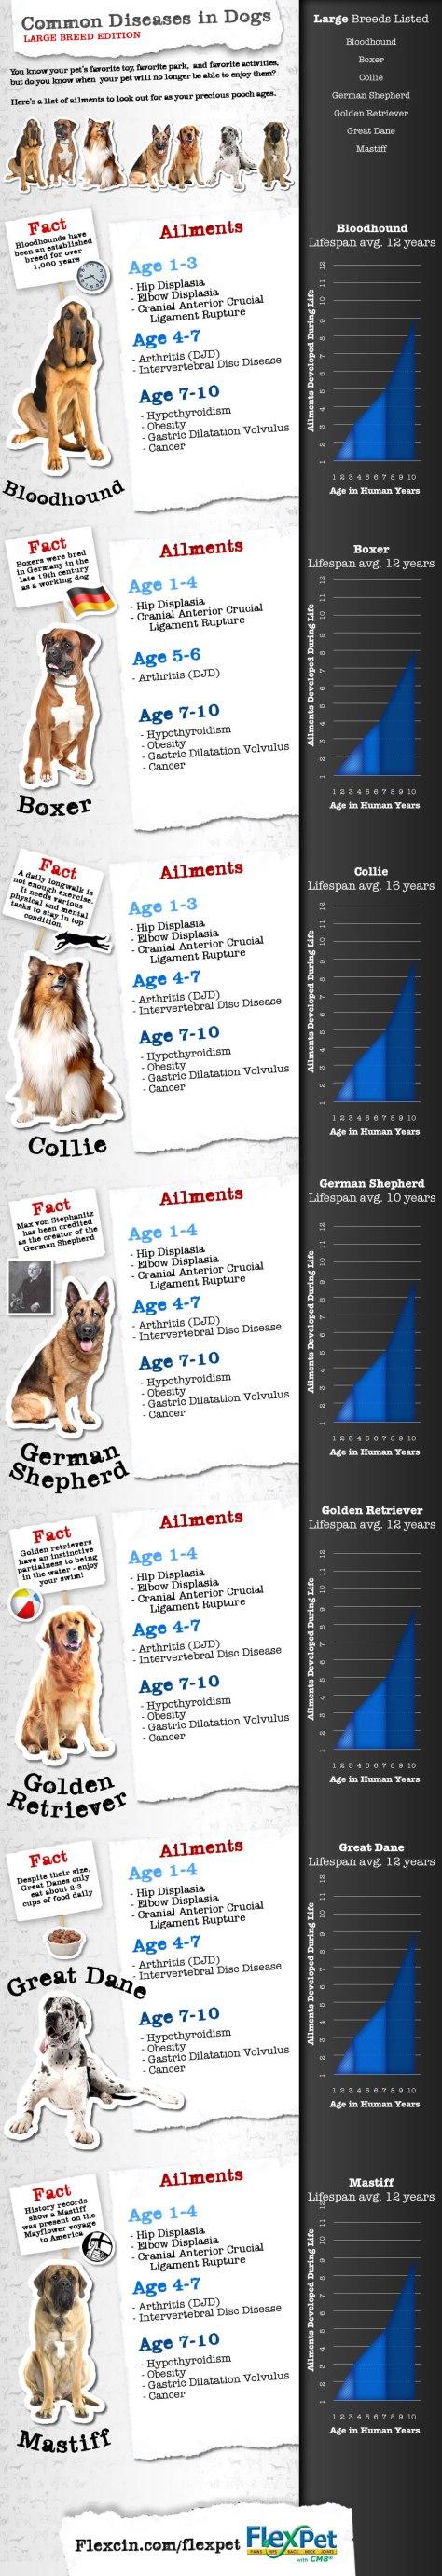 large dog diseases